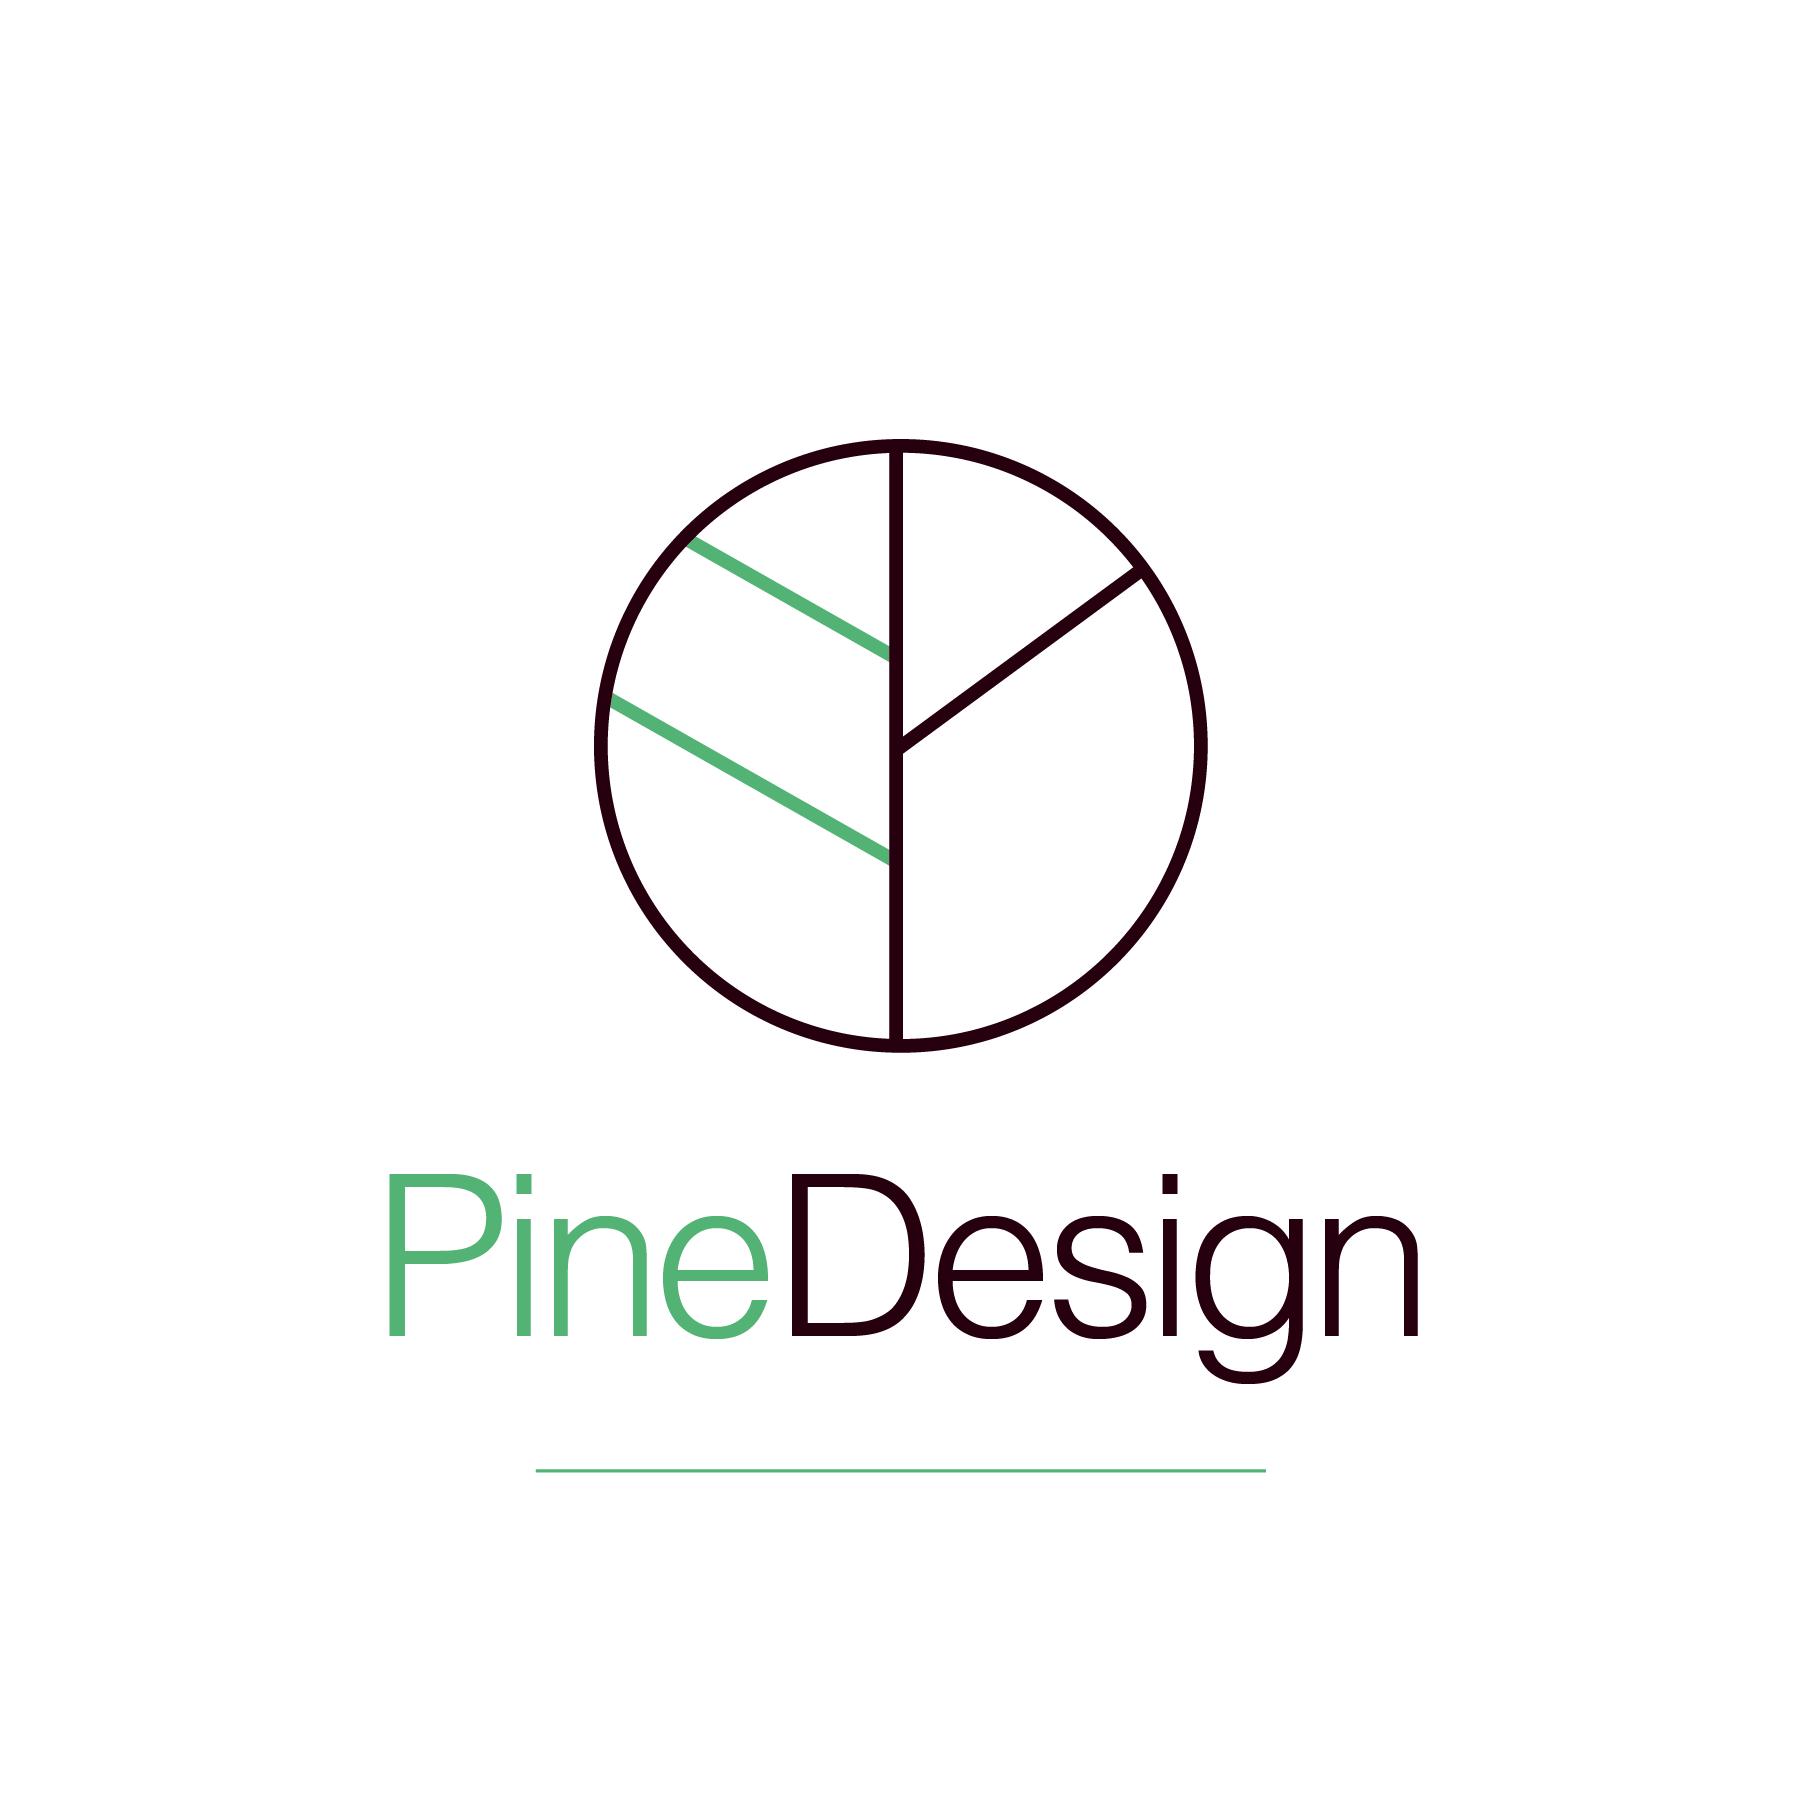 Pine Design Logo